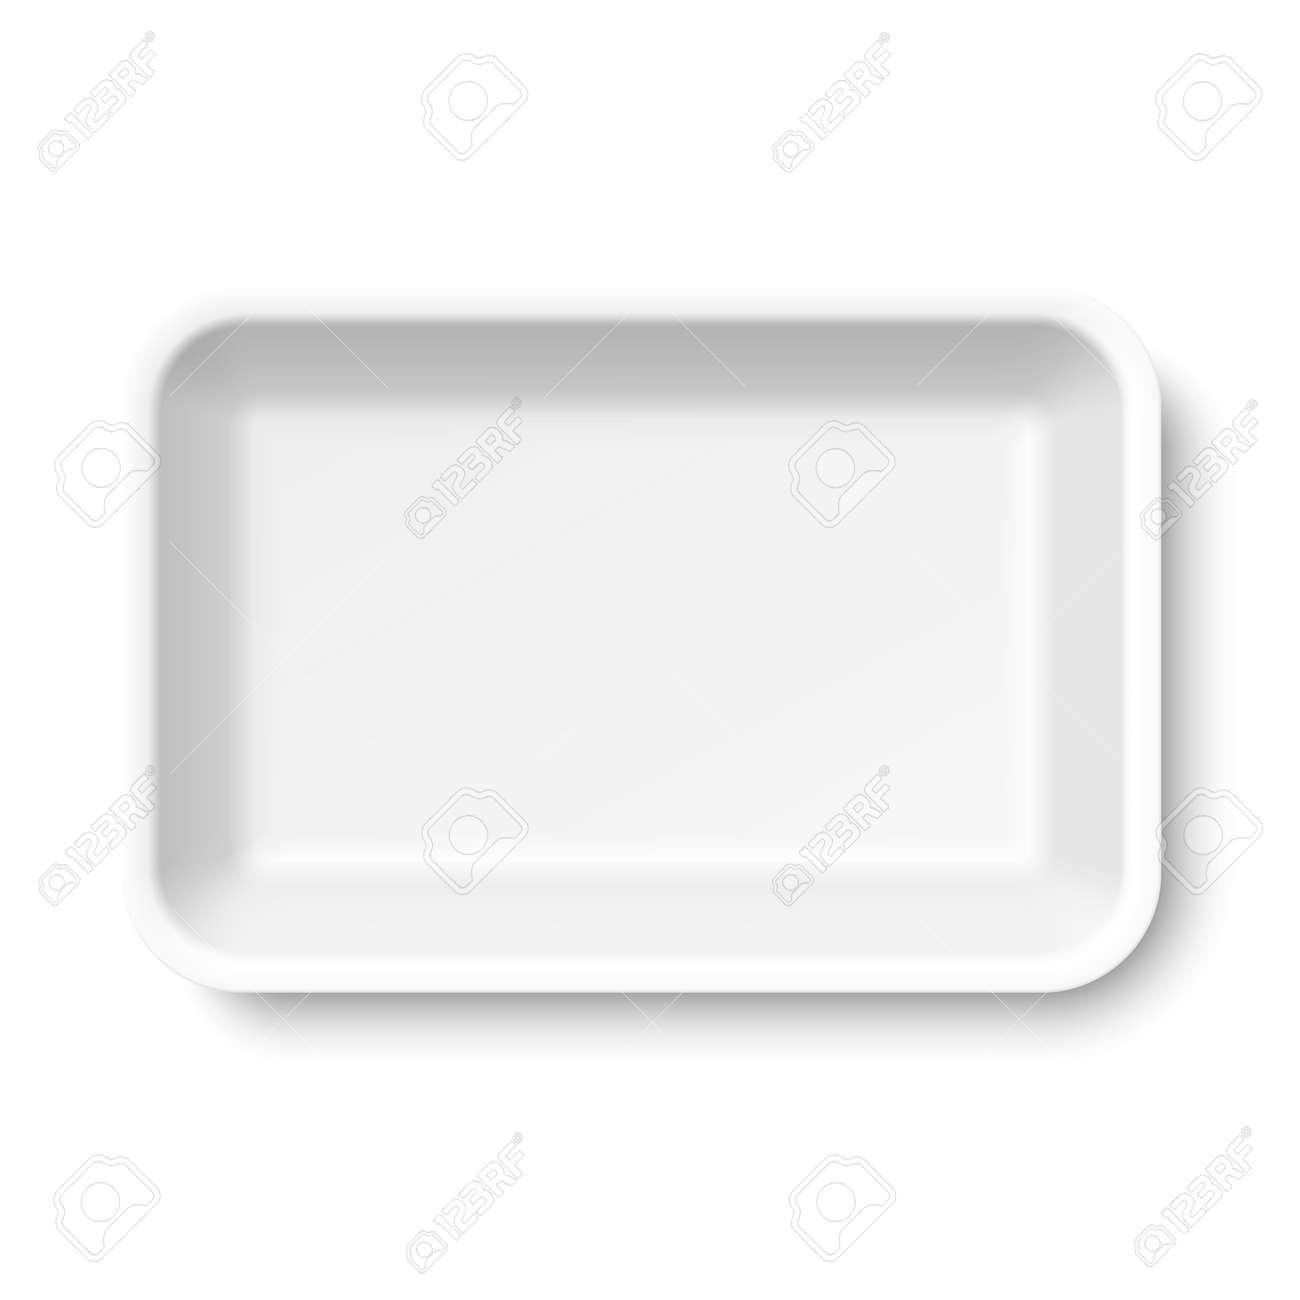 White empty food tray - 50559194